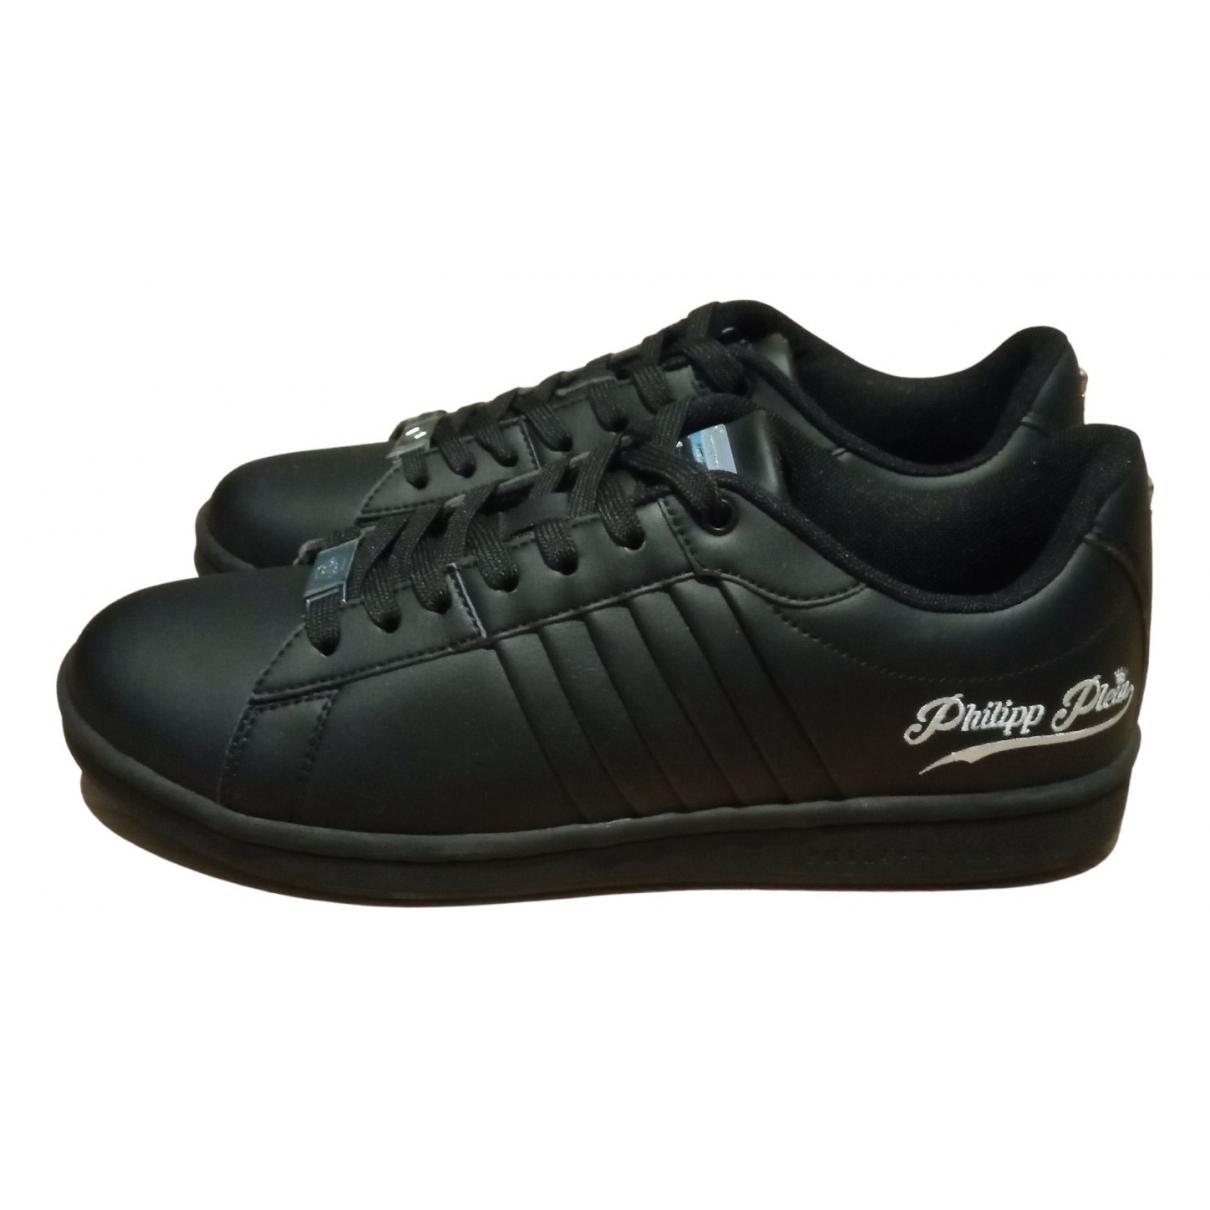 Philipp Plein Original Sneakers in  Schwarz Leder